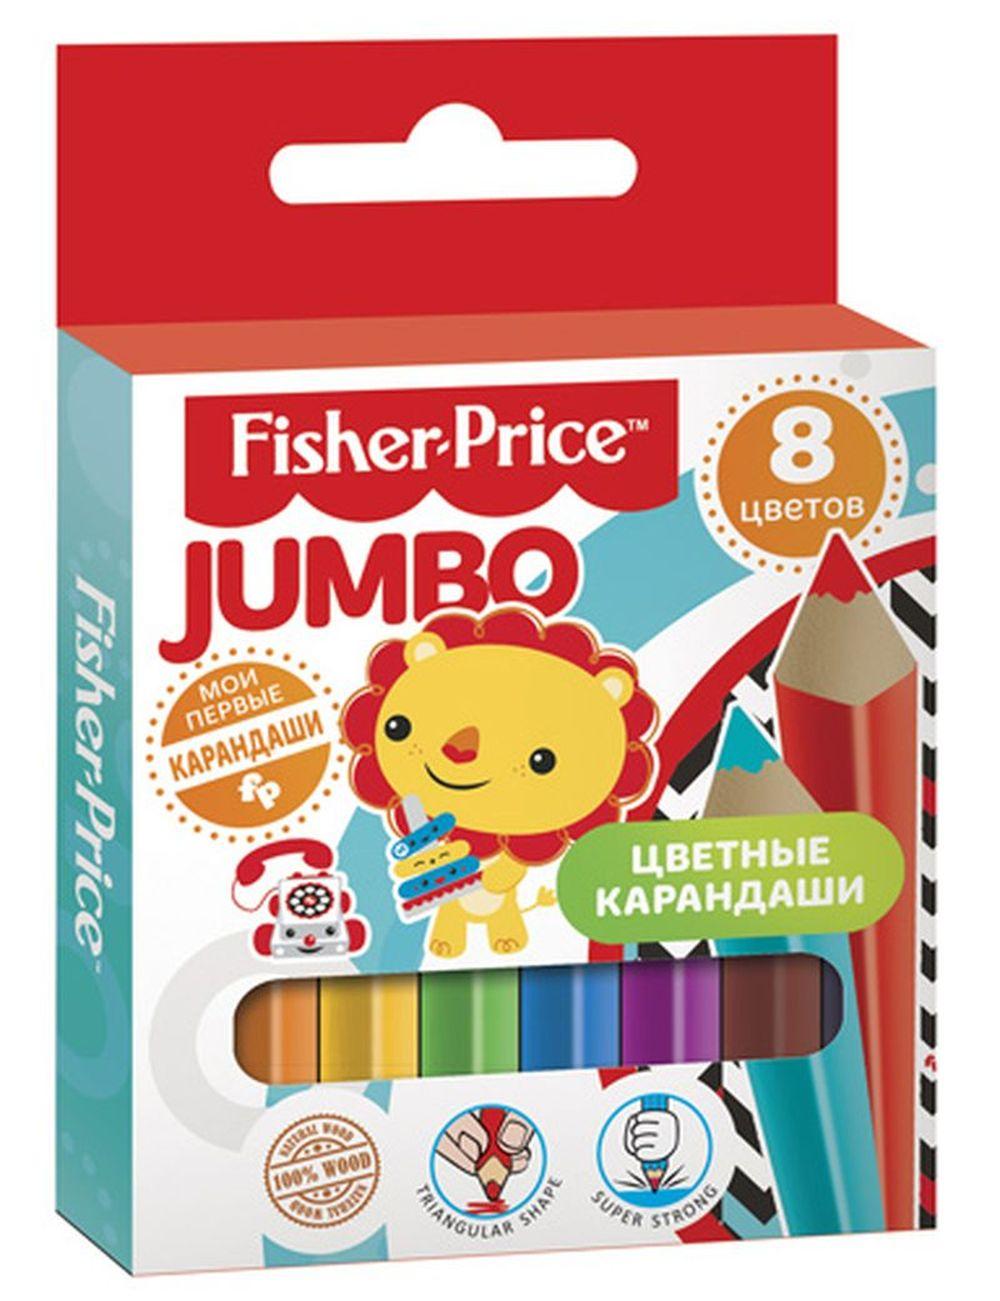 Mattel Набор цветных карандашей Mini Jumbo Mattel Fisher Price 8 цветов mattel набор фигурок fisher price shimmer